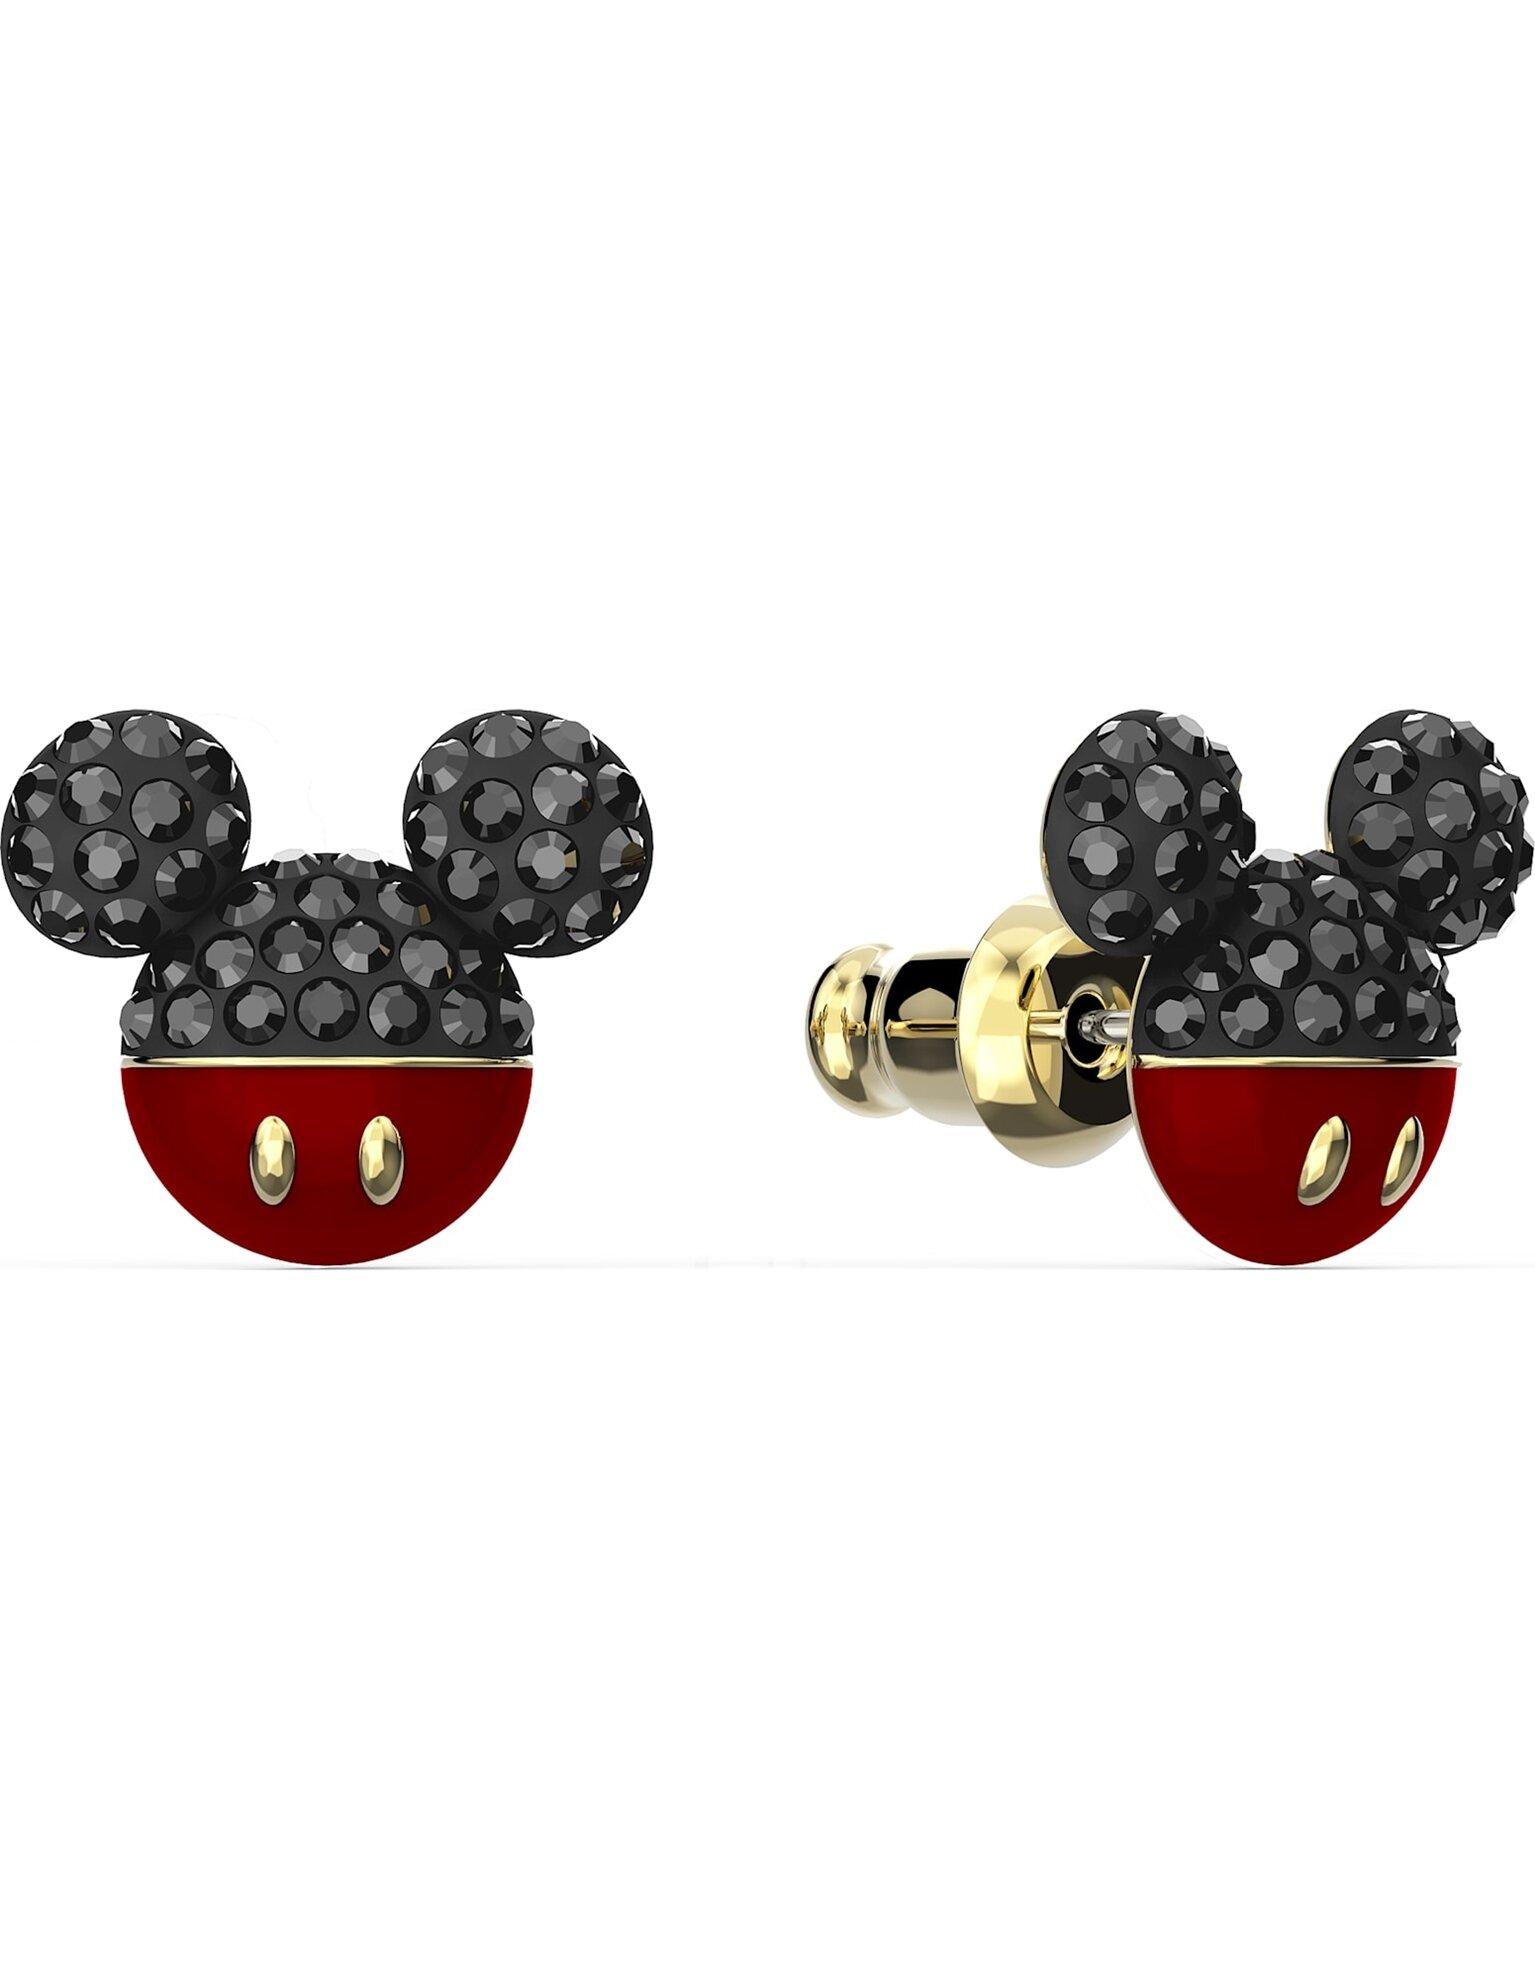 Picture of Mickey İğneli Küpeler, Siyah, Altın rengi kaplama